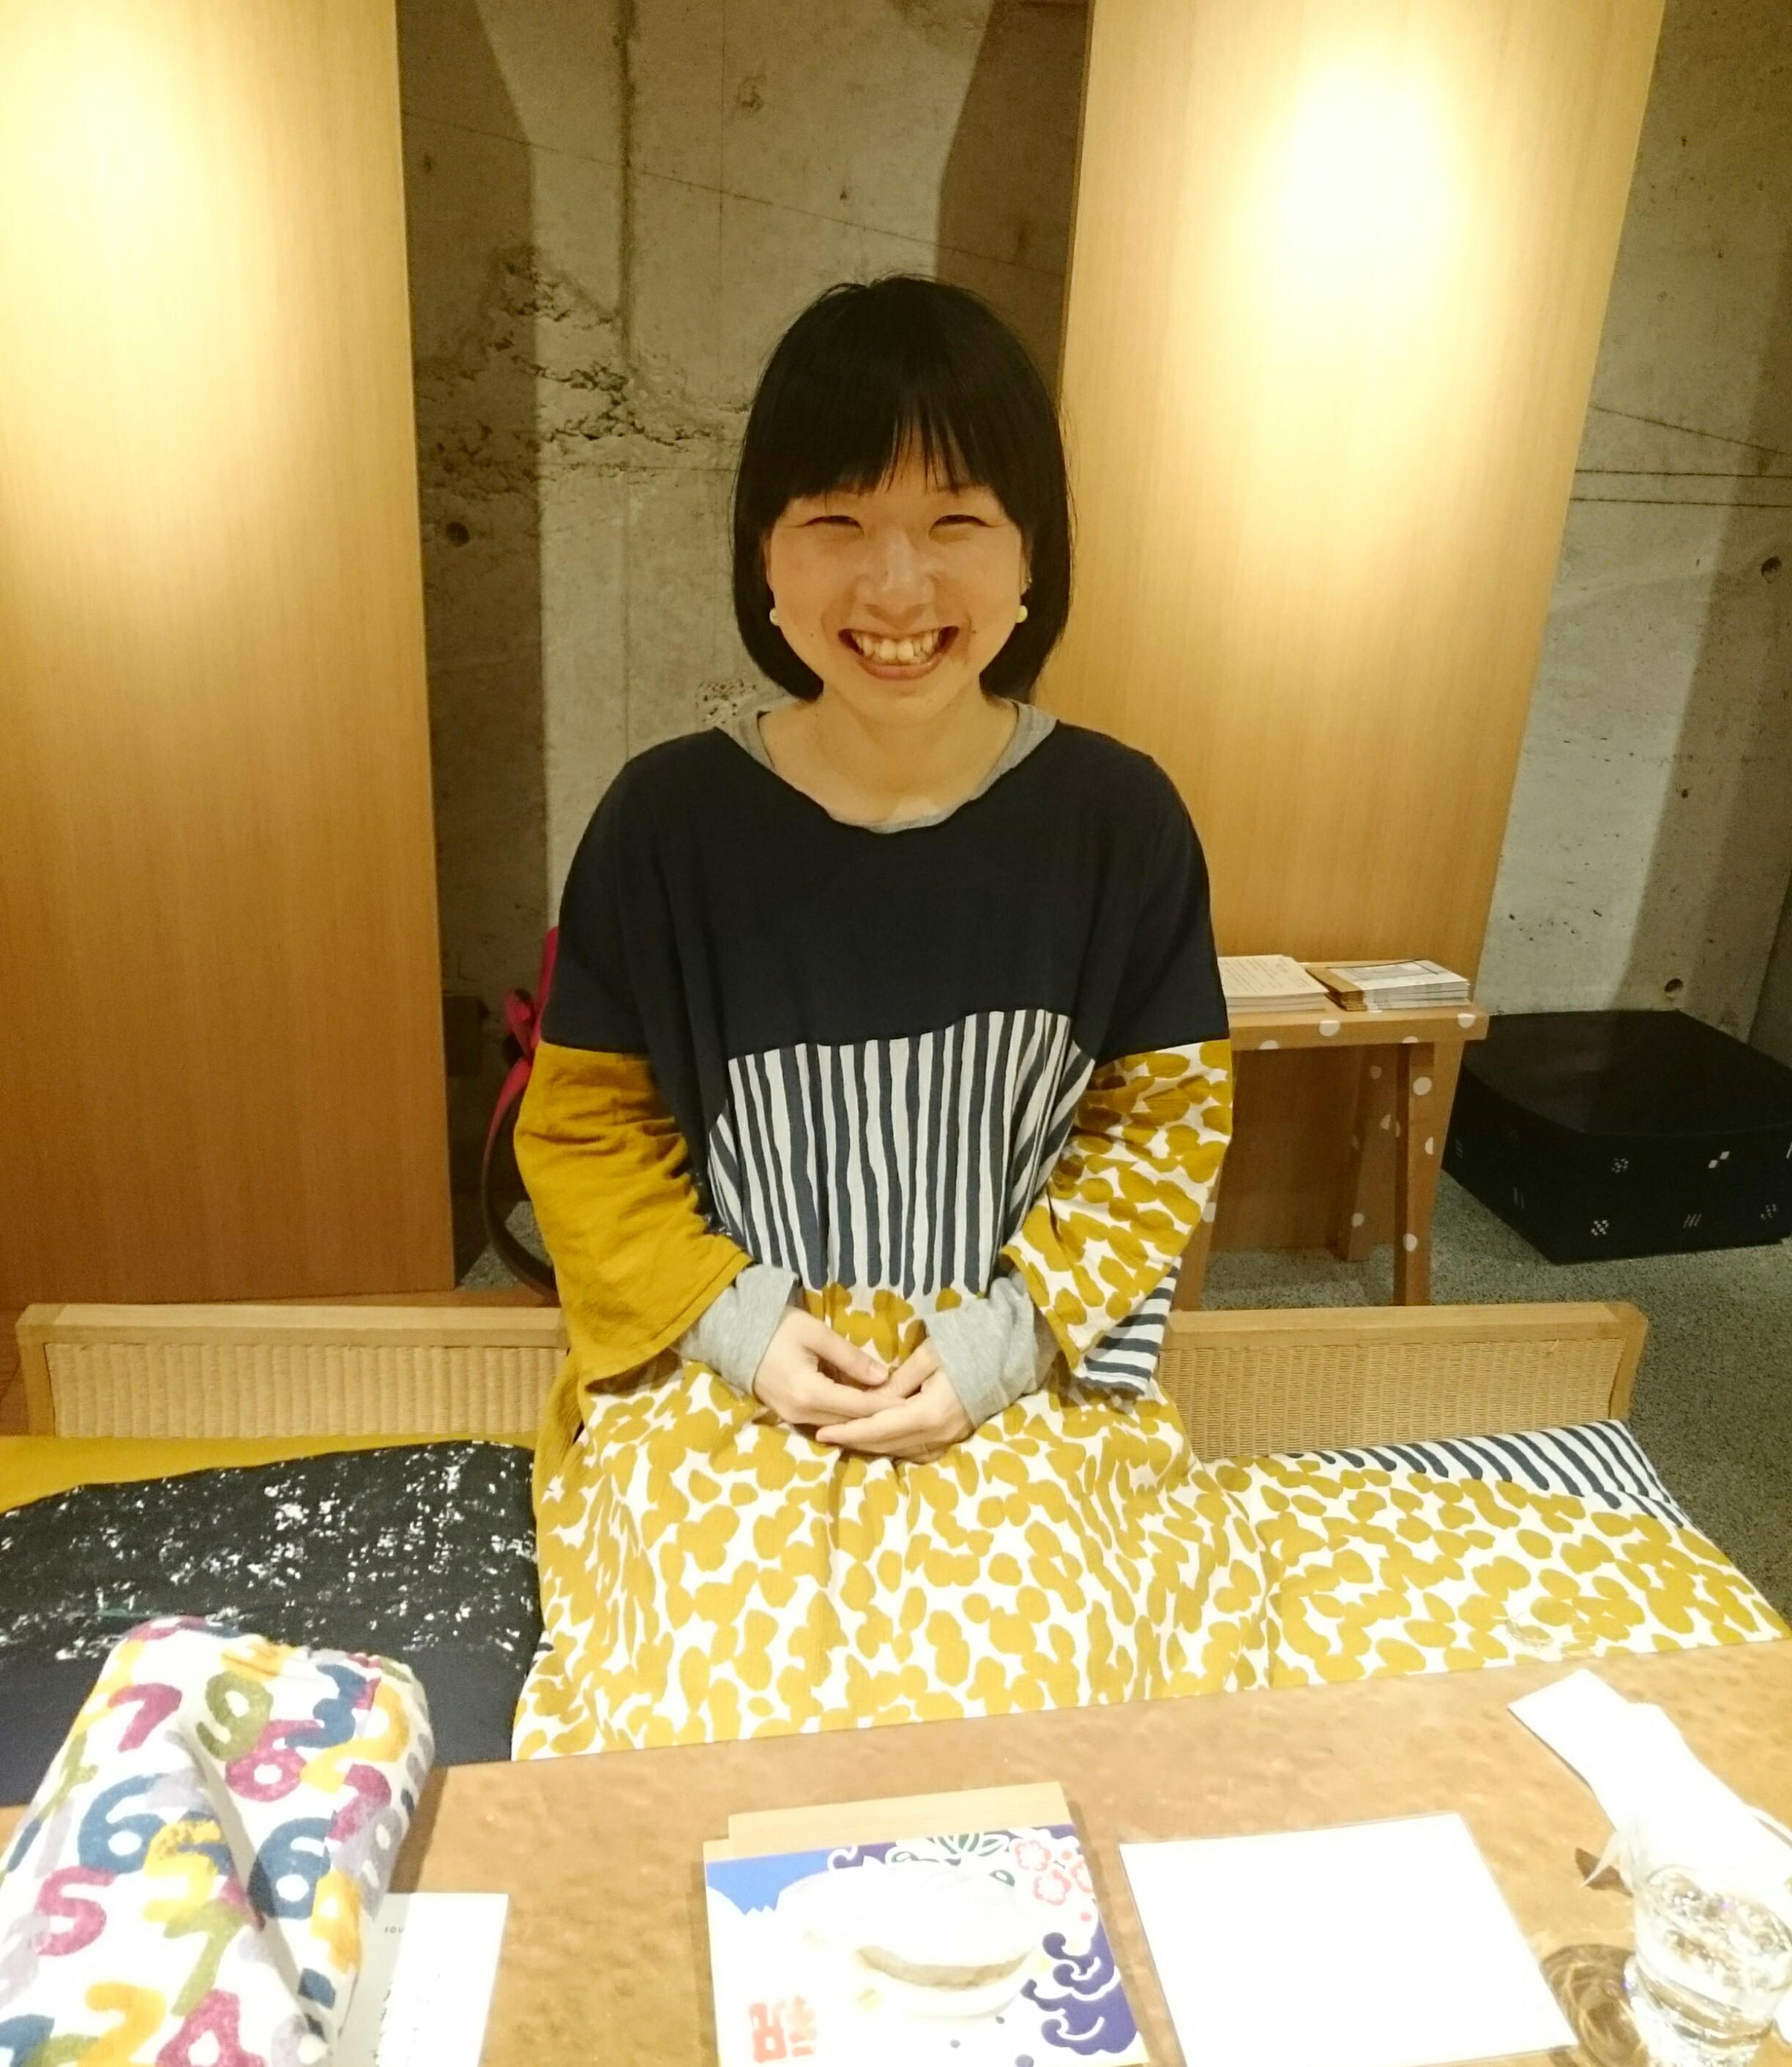 SOU・SOU 在釜〜和菓子になったテキスタイルデザイン